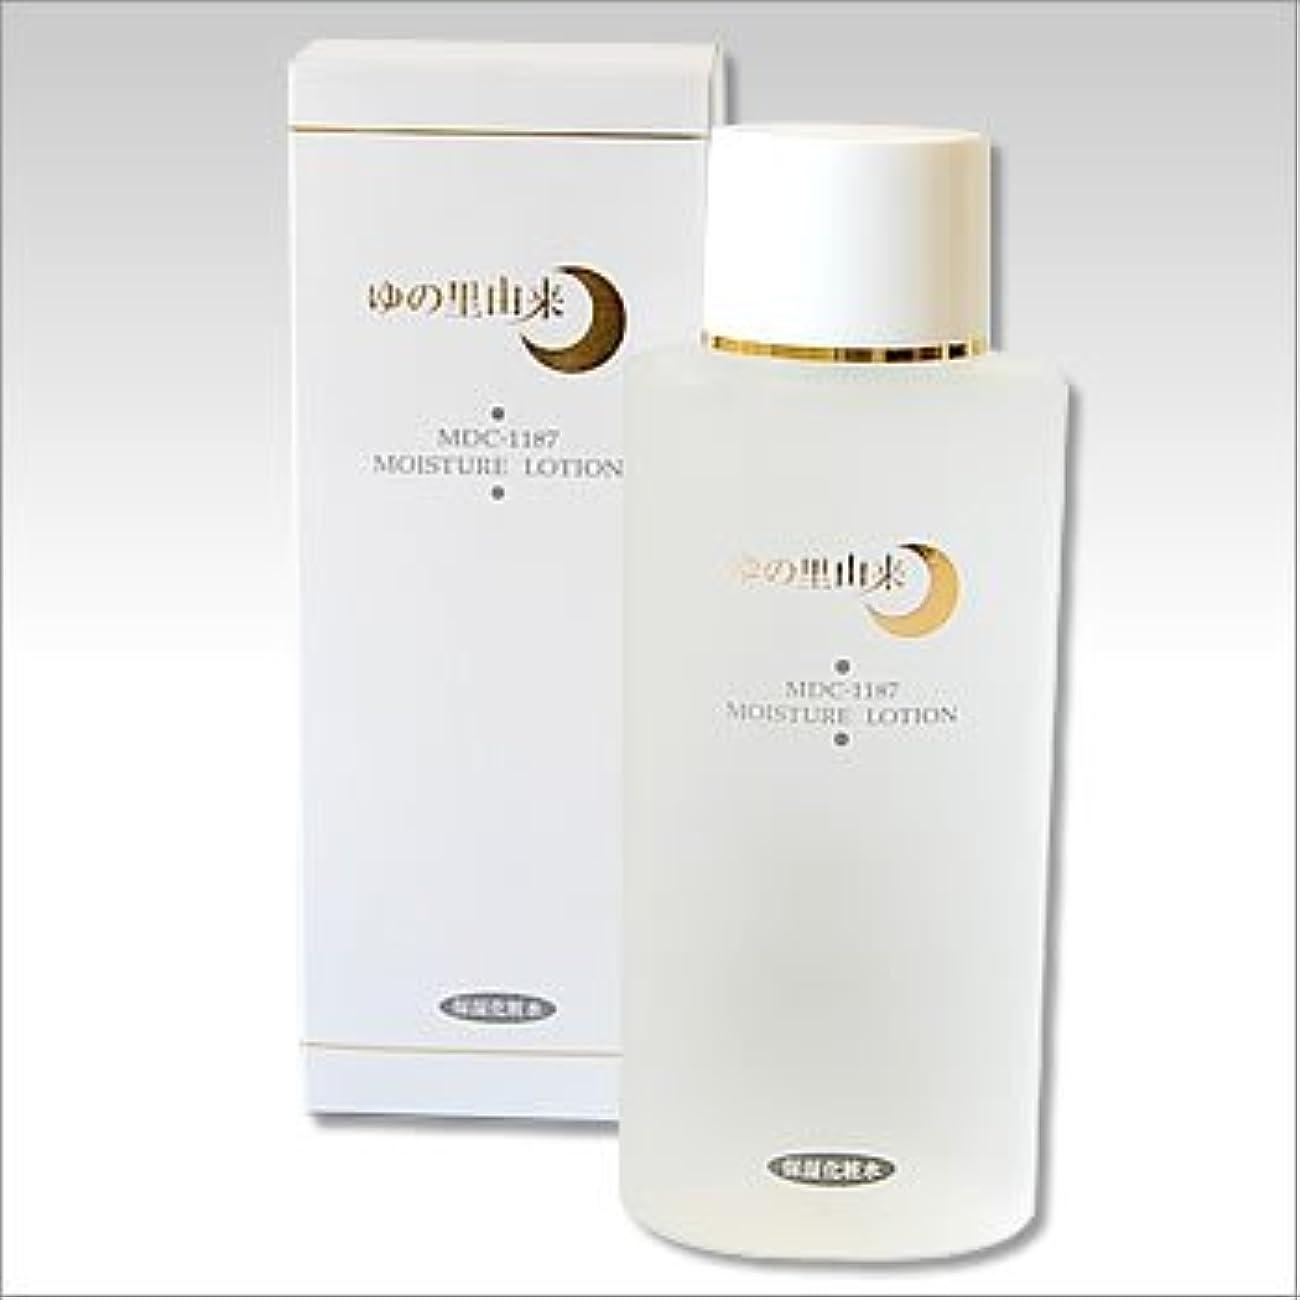 【無添加化粧品】 ゆの里由来 保湿 化粧水 150ml